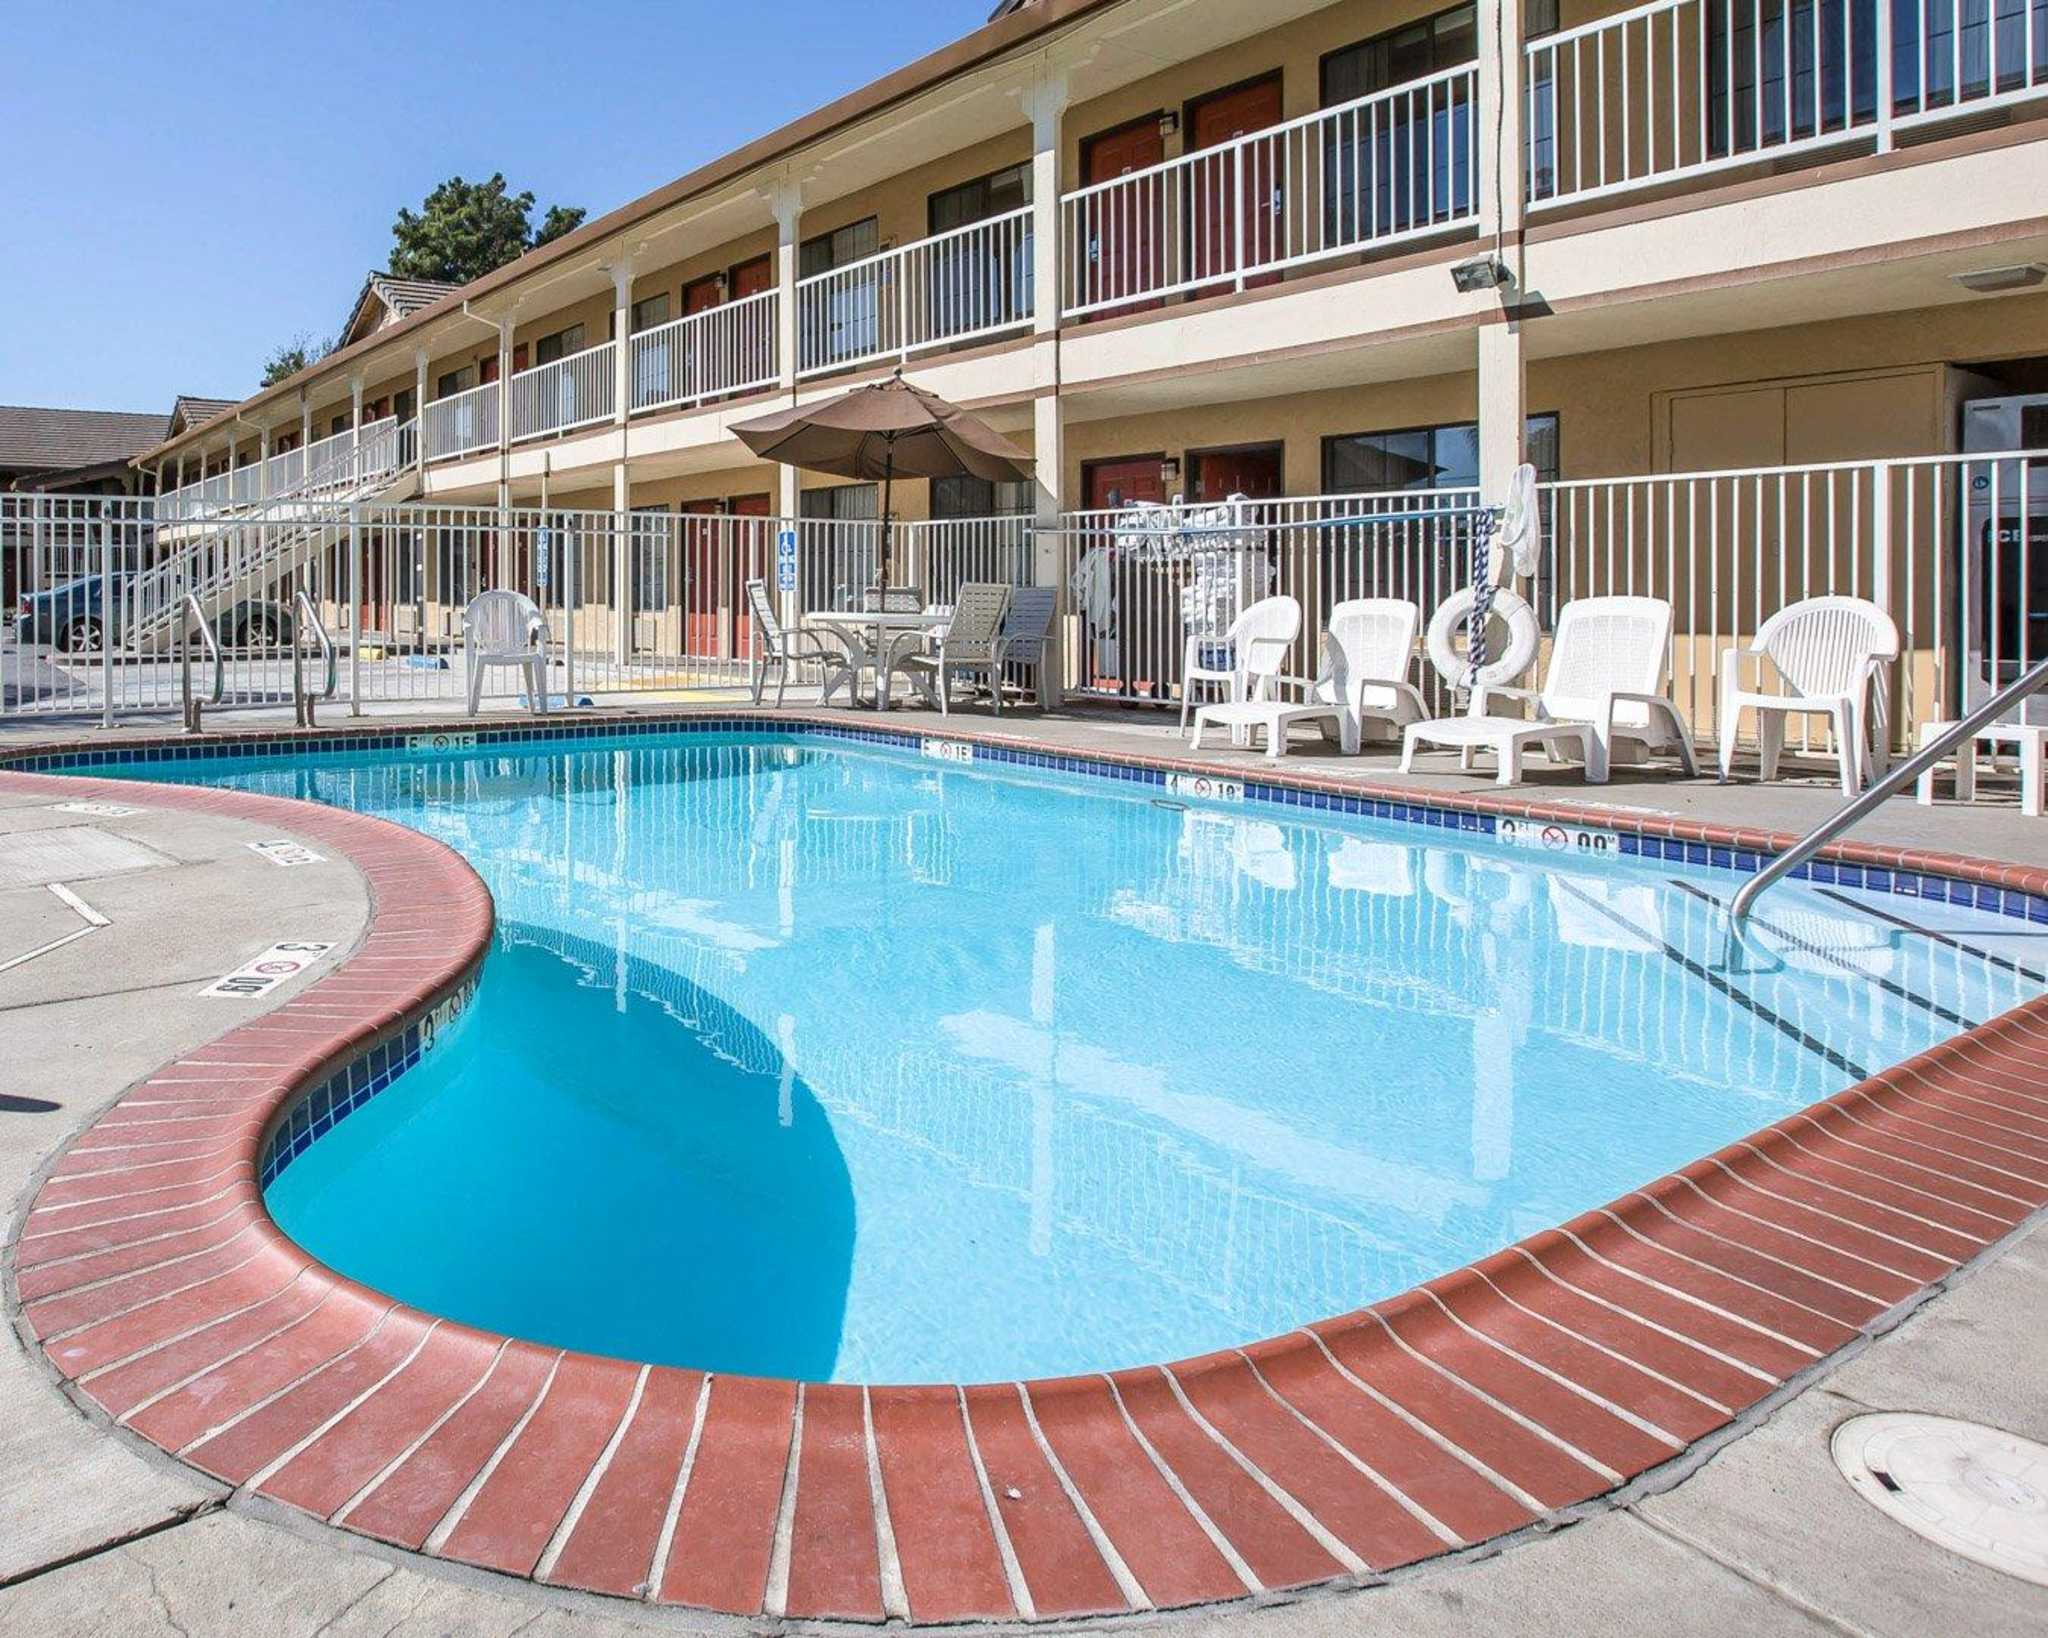 Quality Inn & Suites Woodland - Sacramento Airport image 12